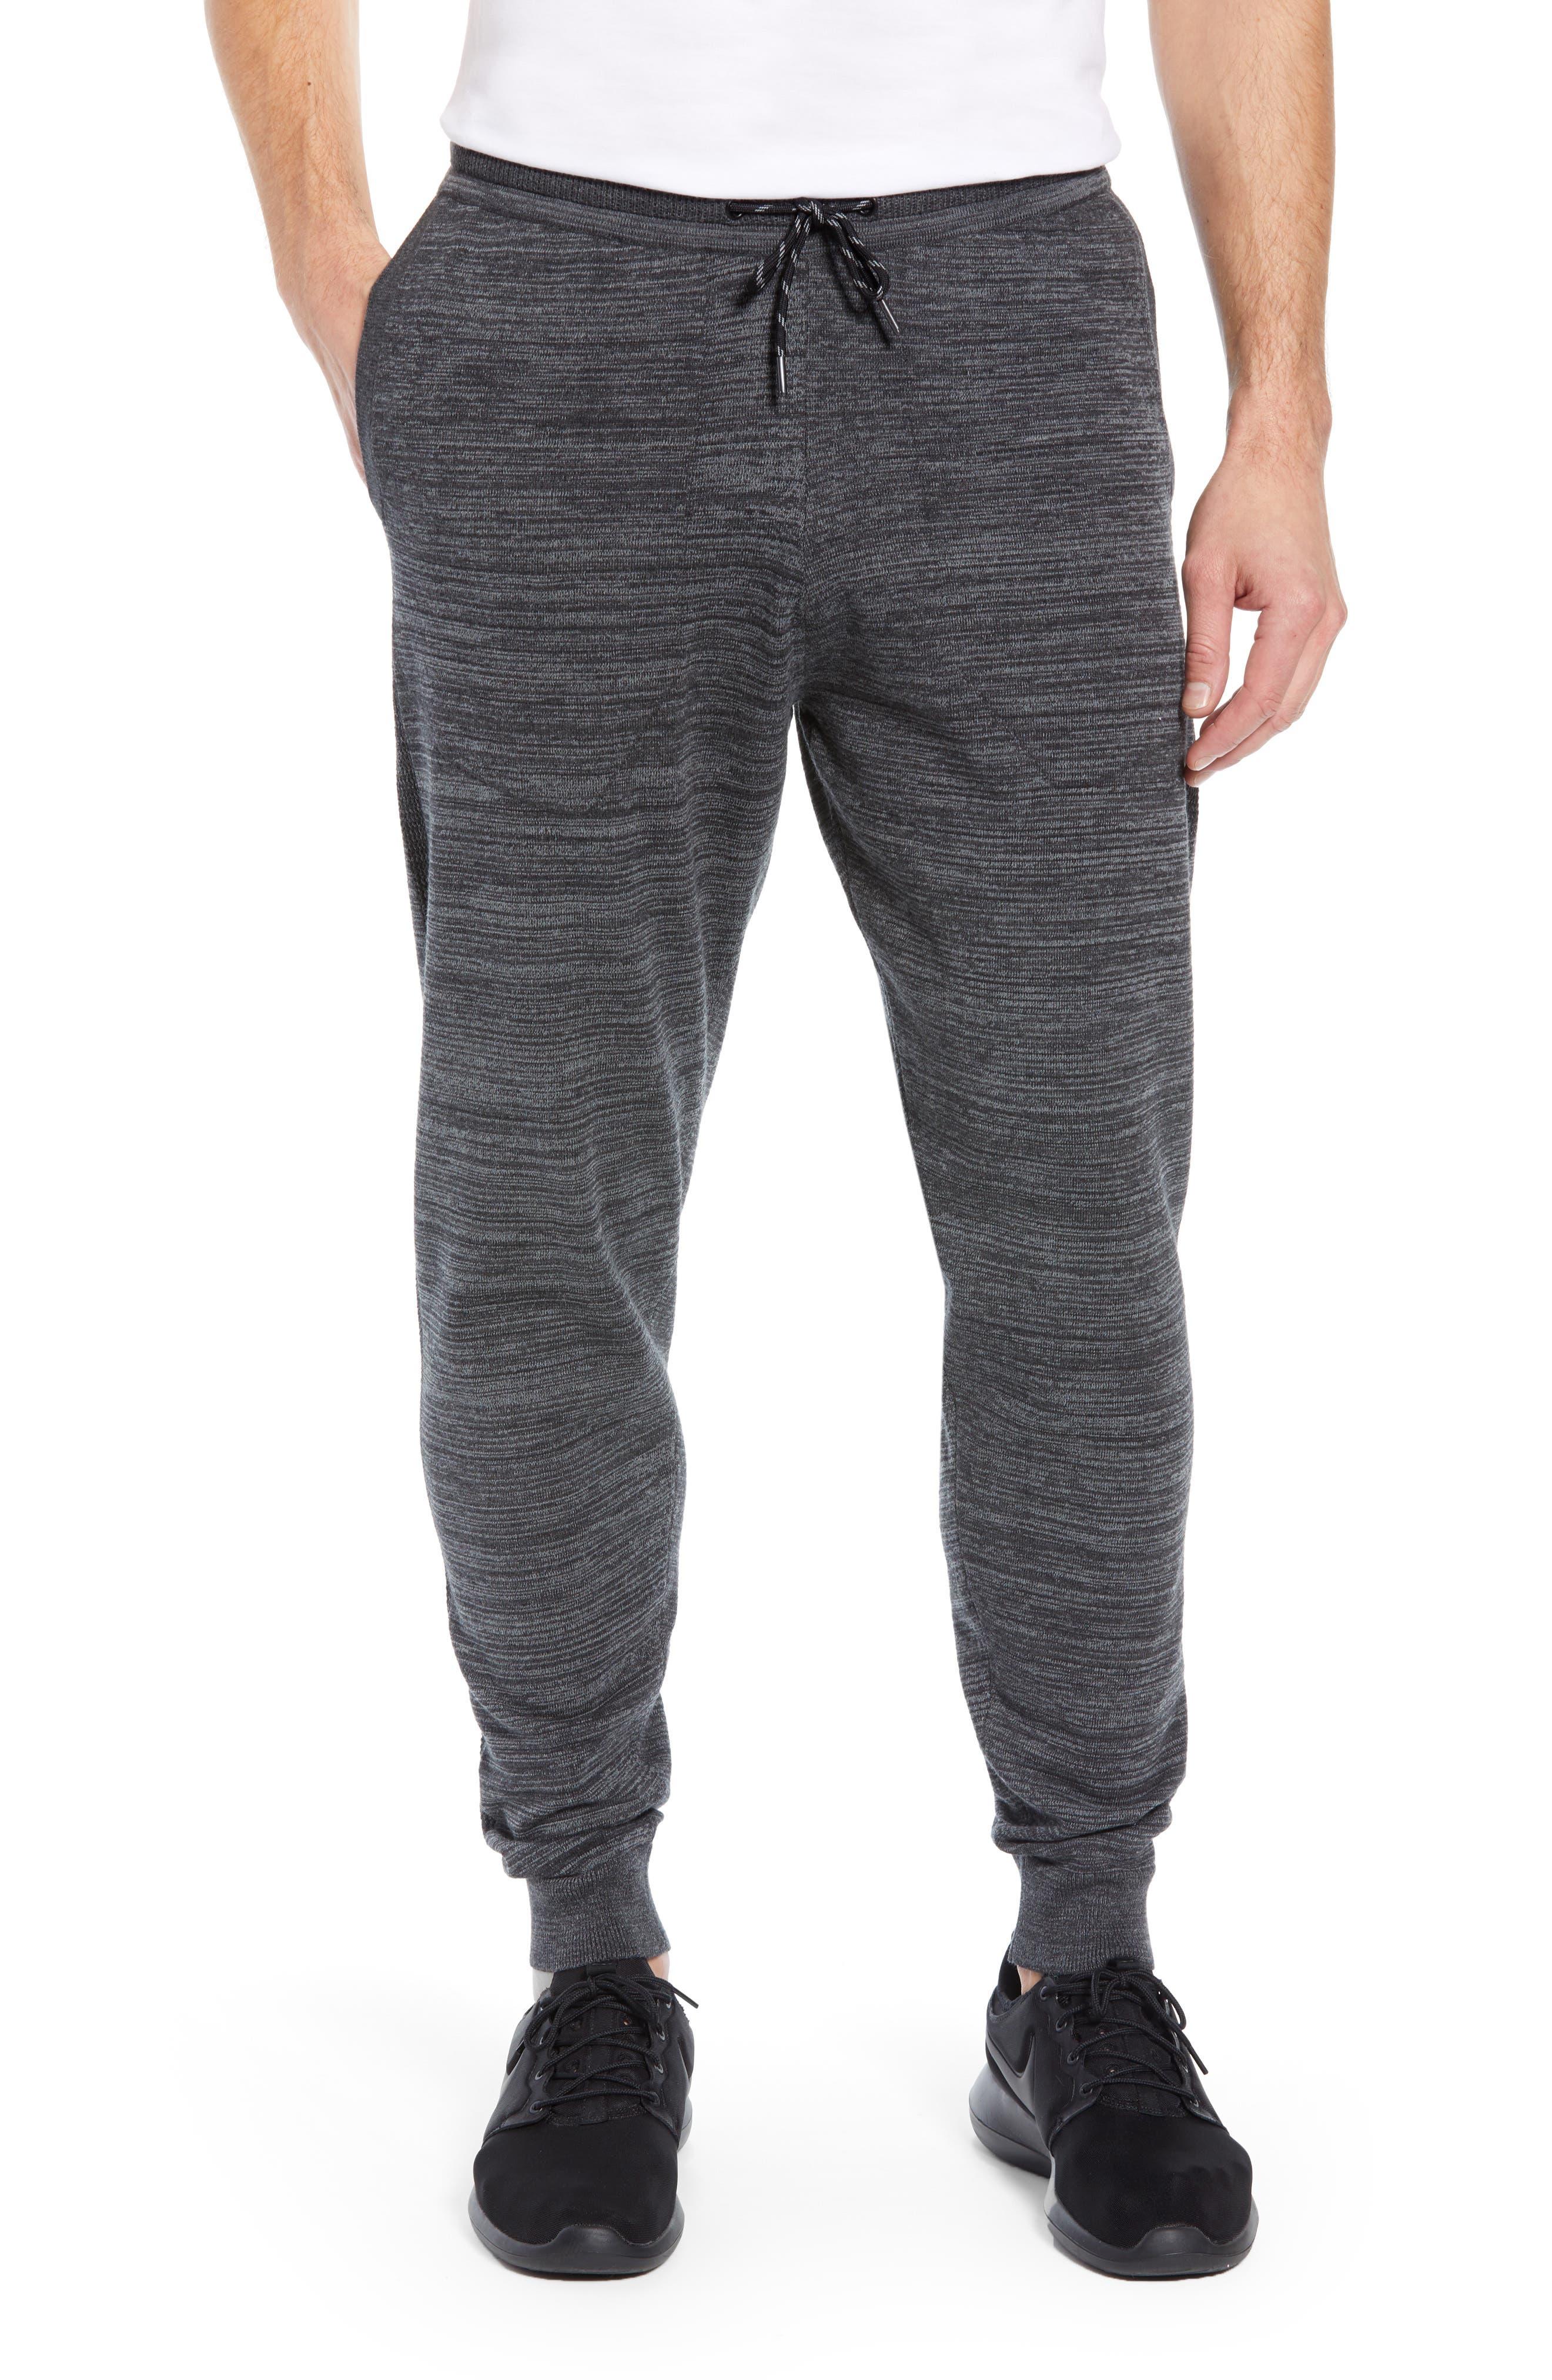 Tech Sweater Knit Jogger Pants,                             Main thumbnail 1, color,                             BLACK OXIDE SPACEDYE